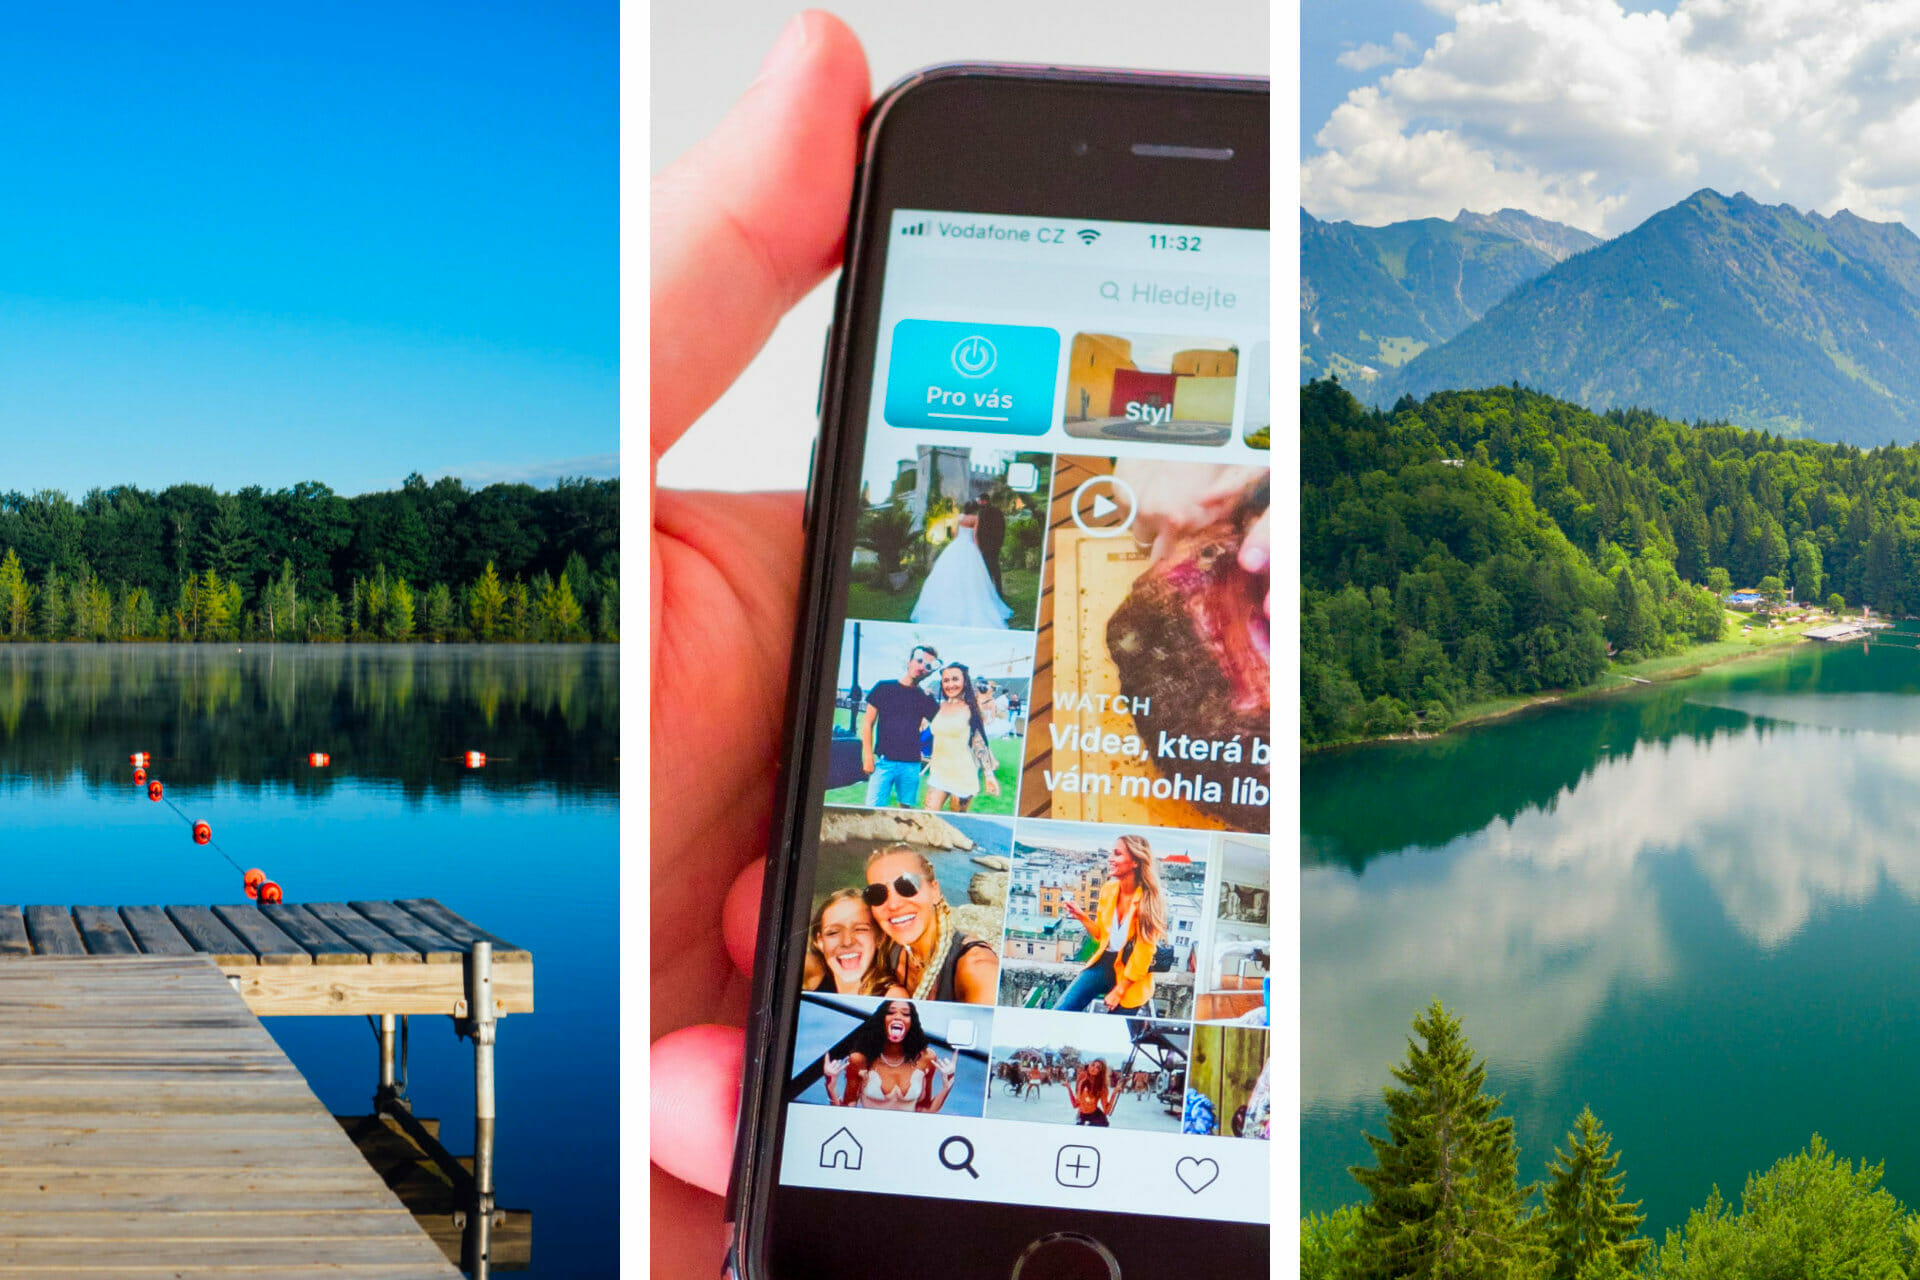 33 Unique Lake Captions for Instagram via @allamericanatlas